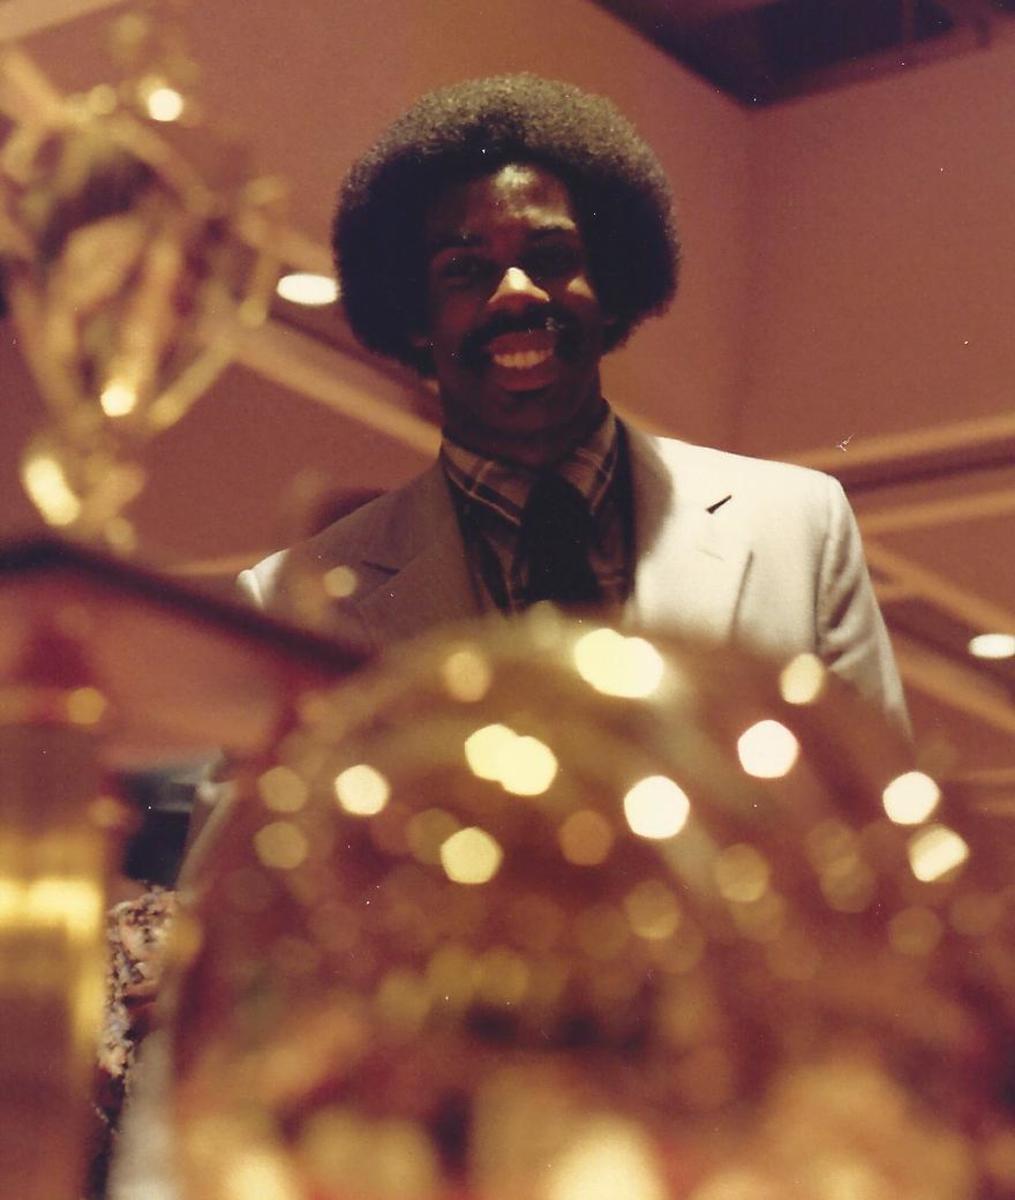 Reggie King (photo by Jimmy Bank)